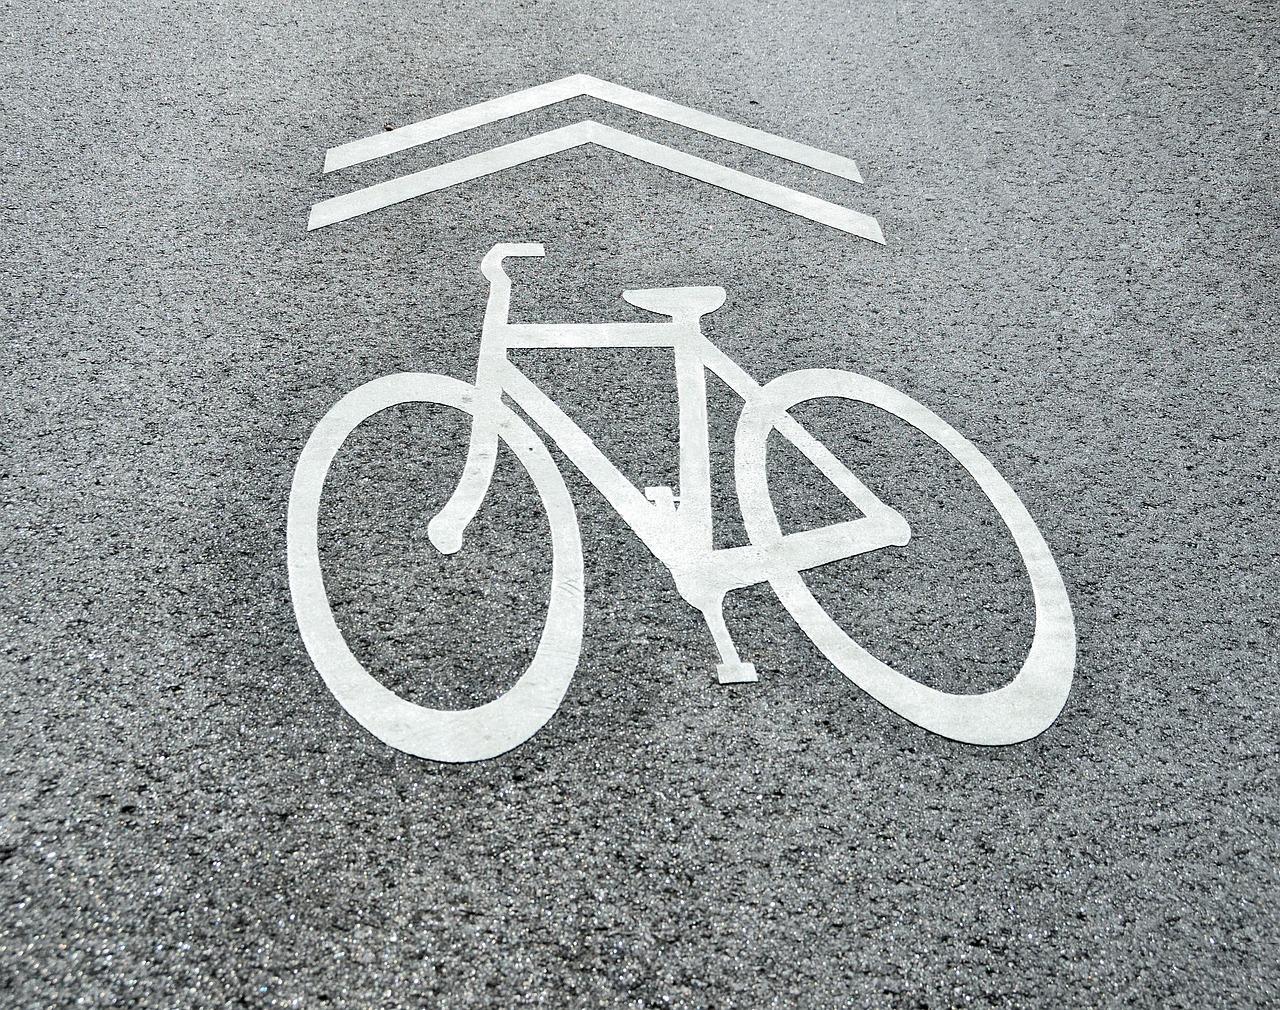 Bike Lanes to Nowhere